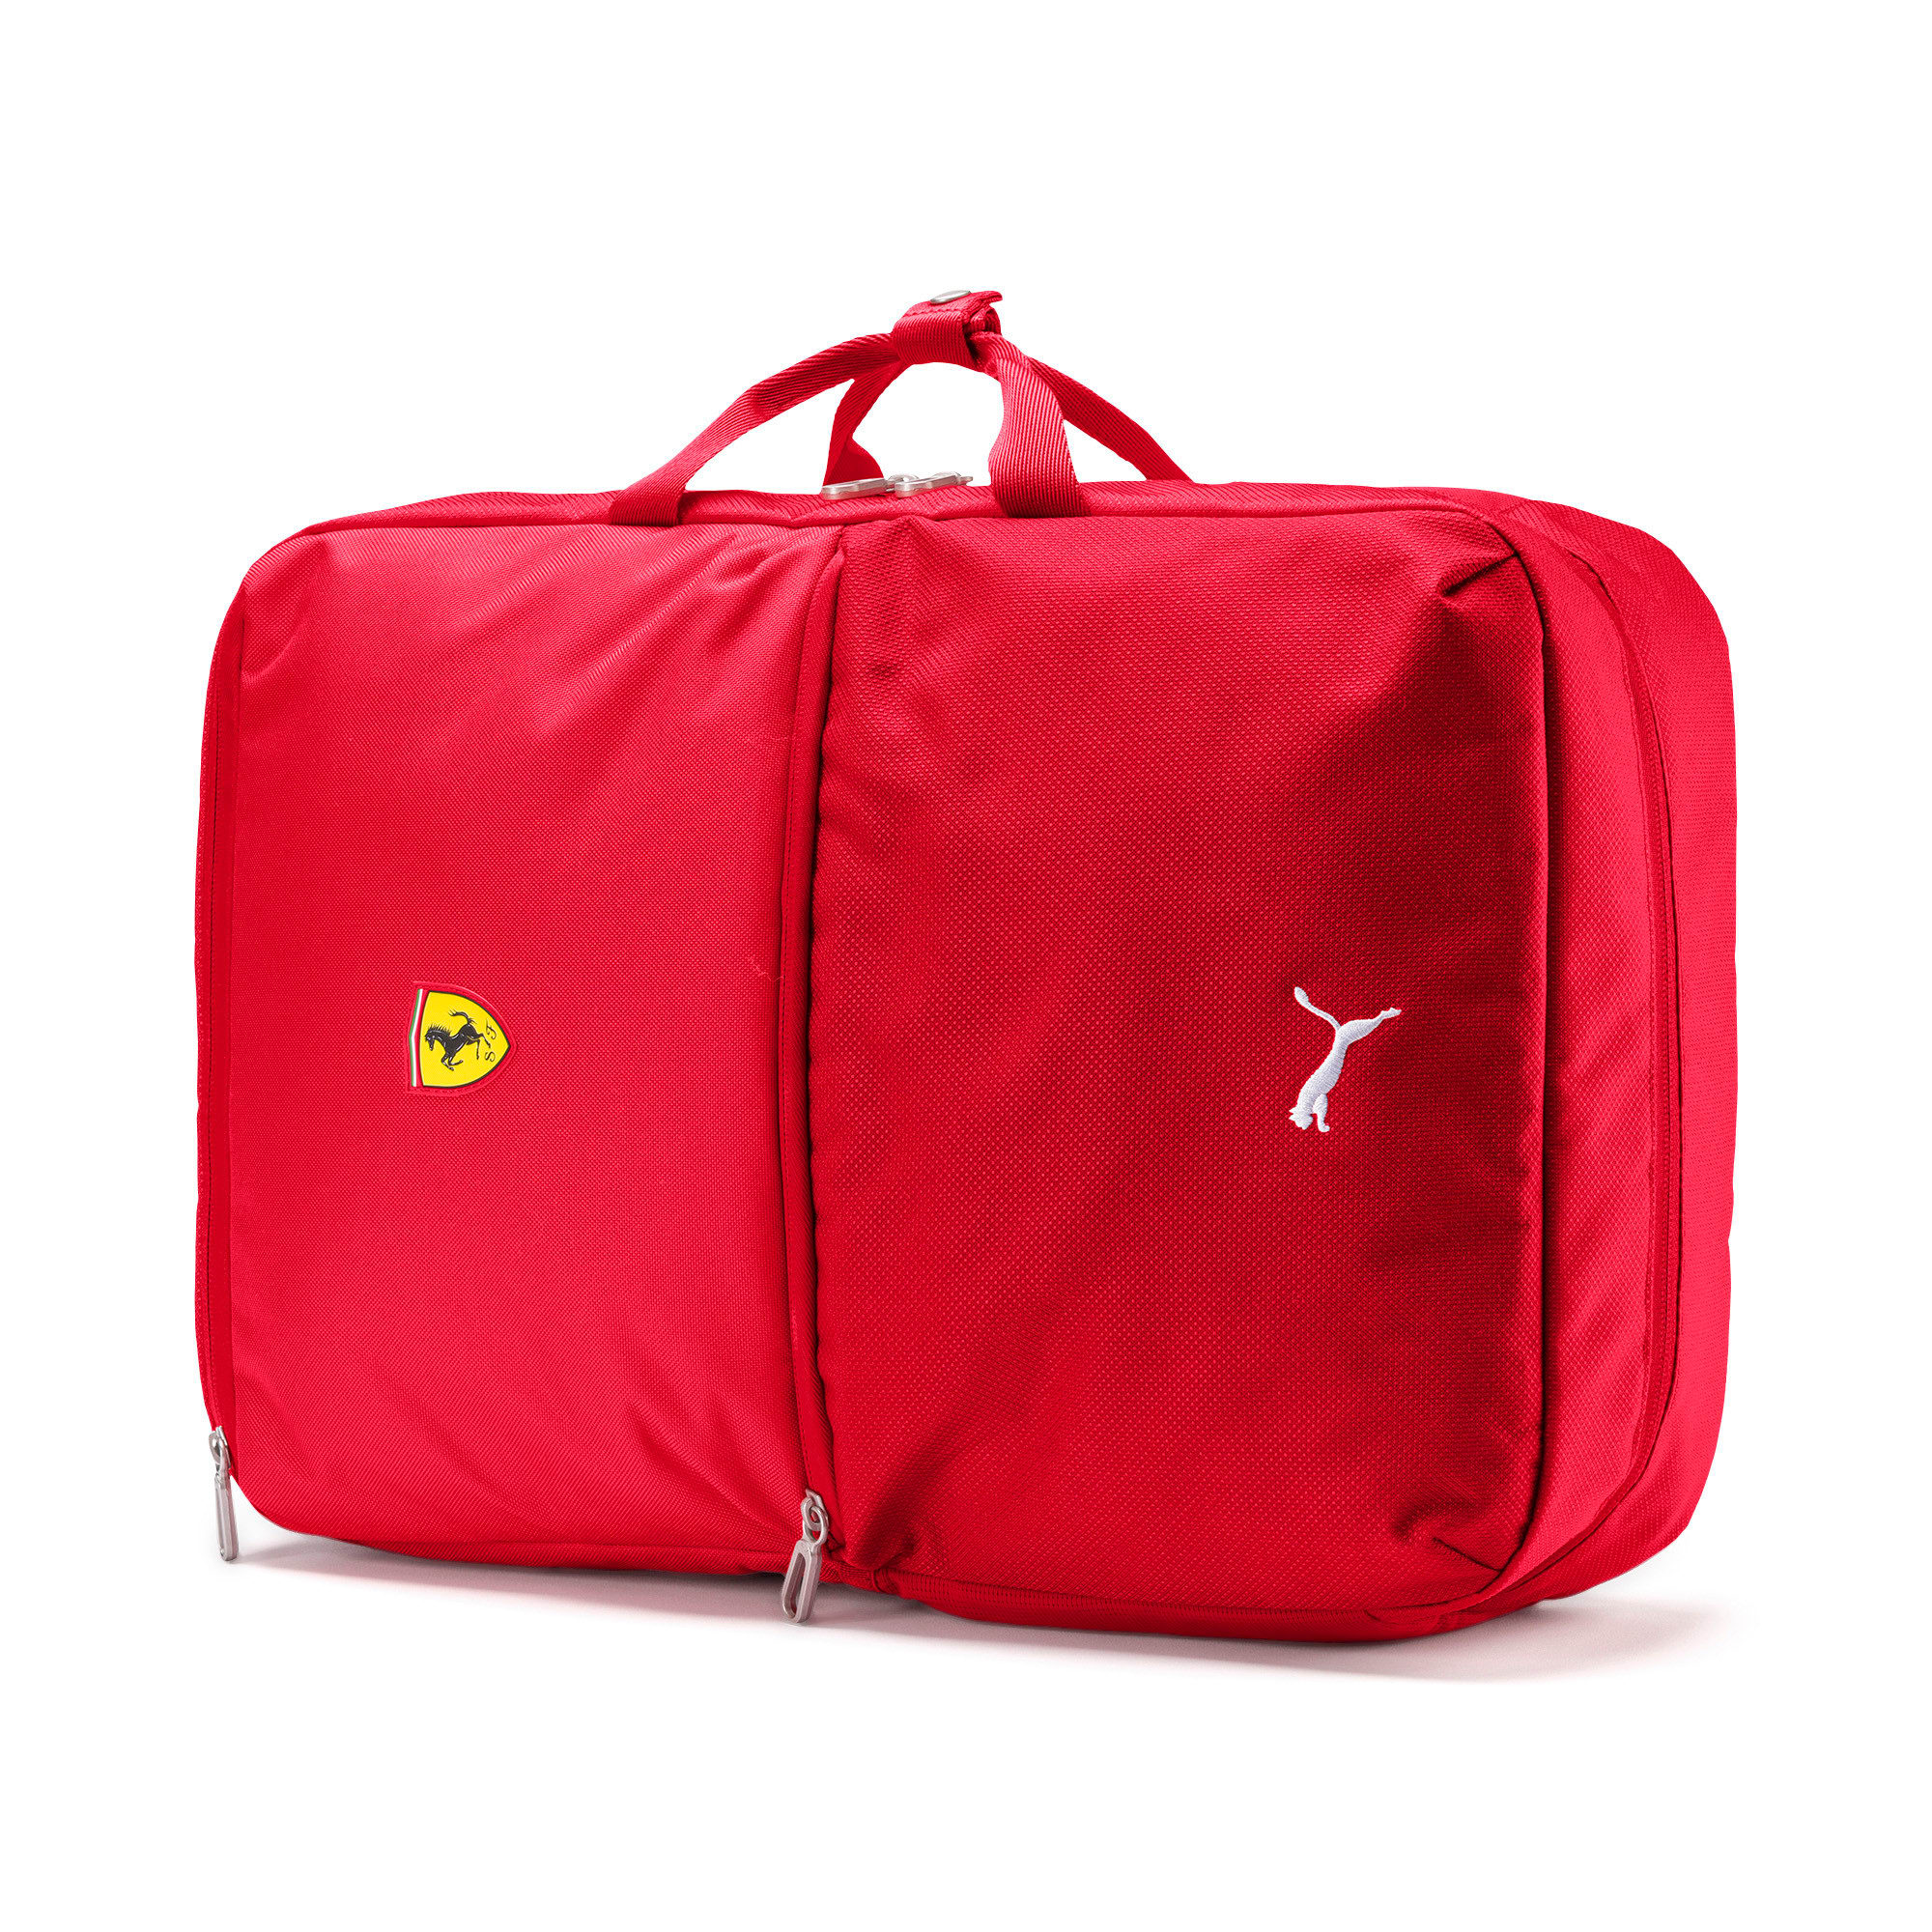 Thumbnail 3 of Ferrari Replica Backpack, Rosso Corsa, medium